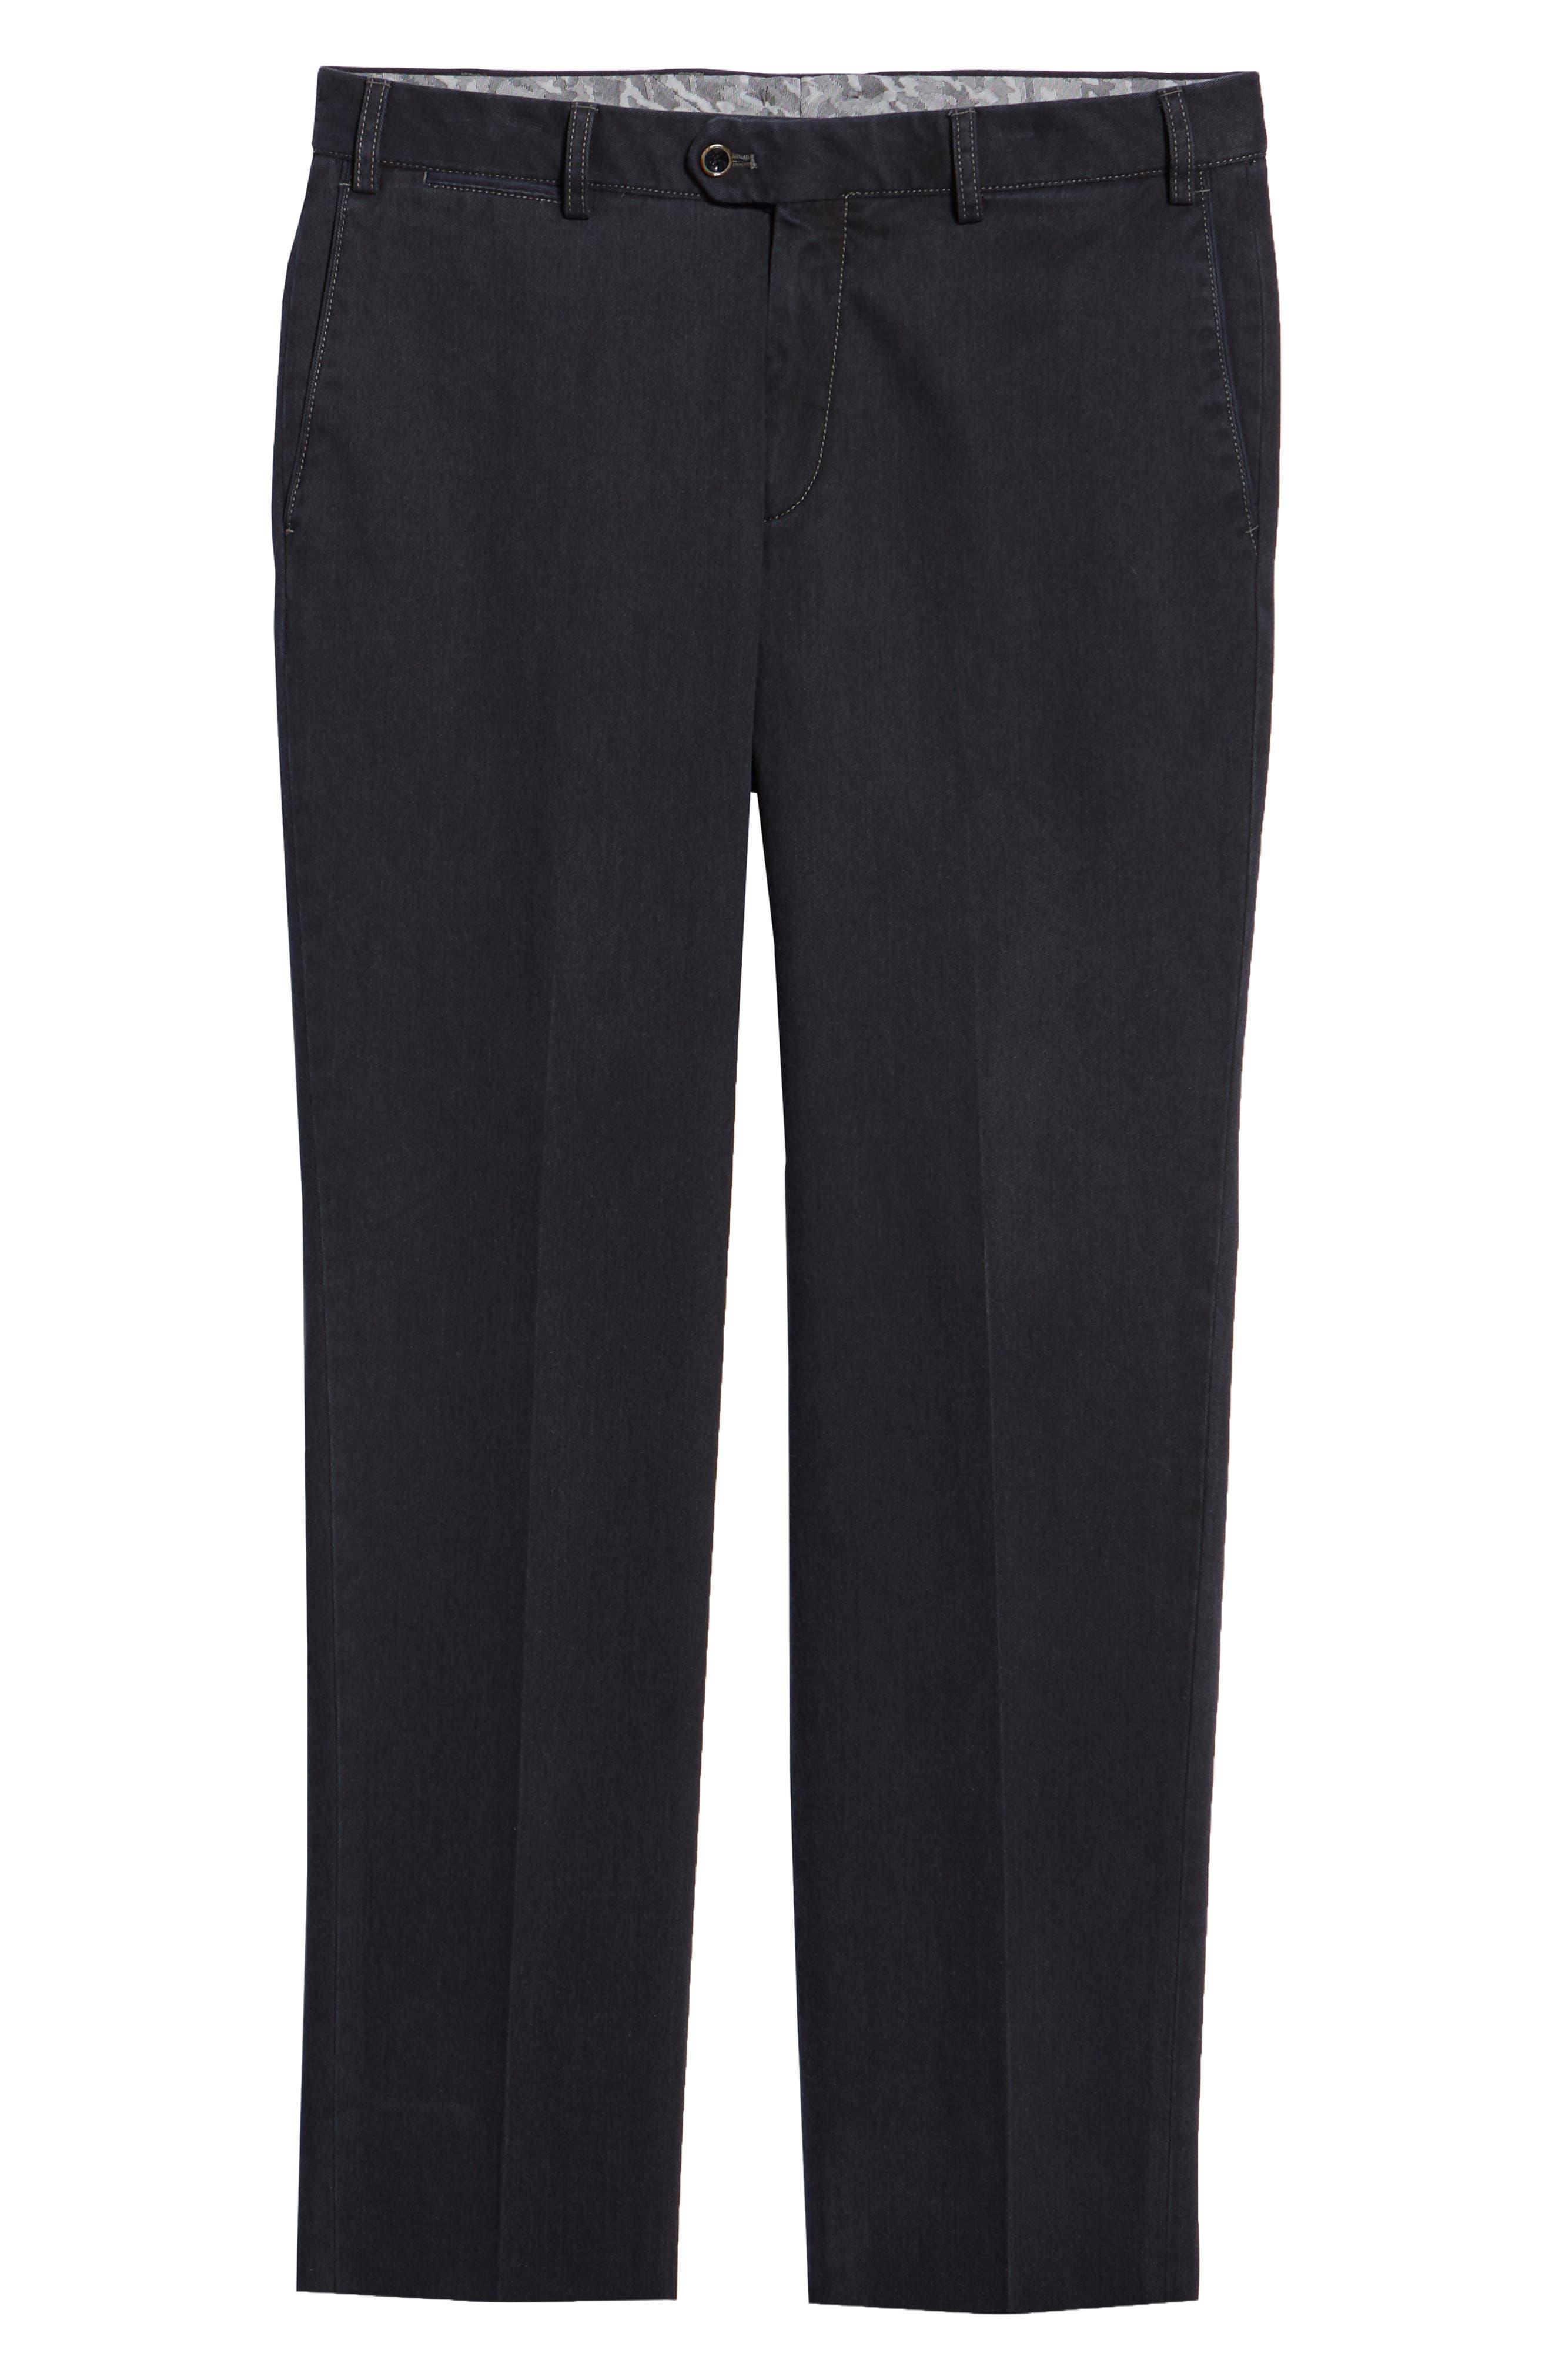 Pero Trim Fit Stretch Flat Front Cotton Blend Trousers,                             Alternate thumbnail 6, color,                             CHARCOAL